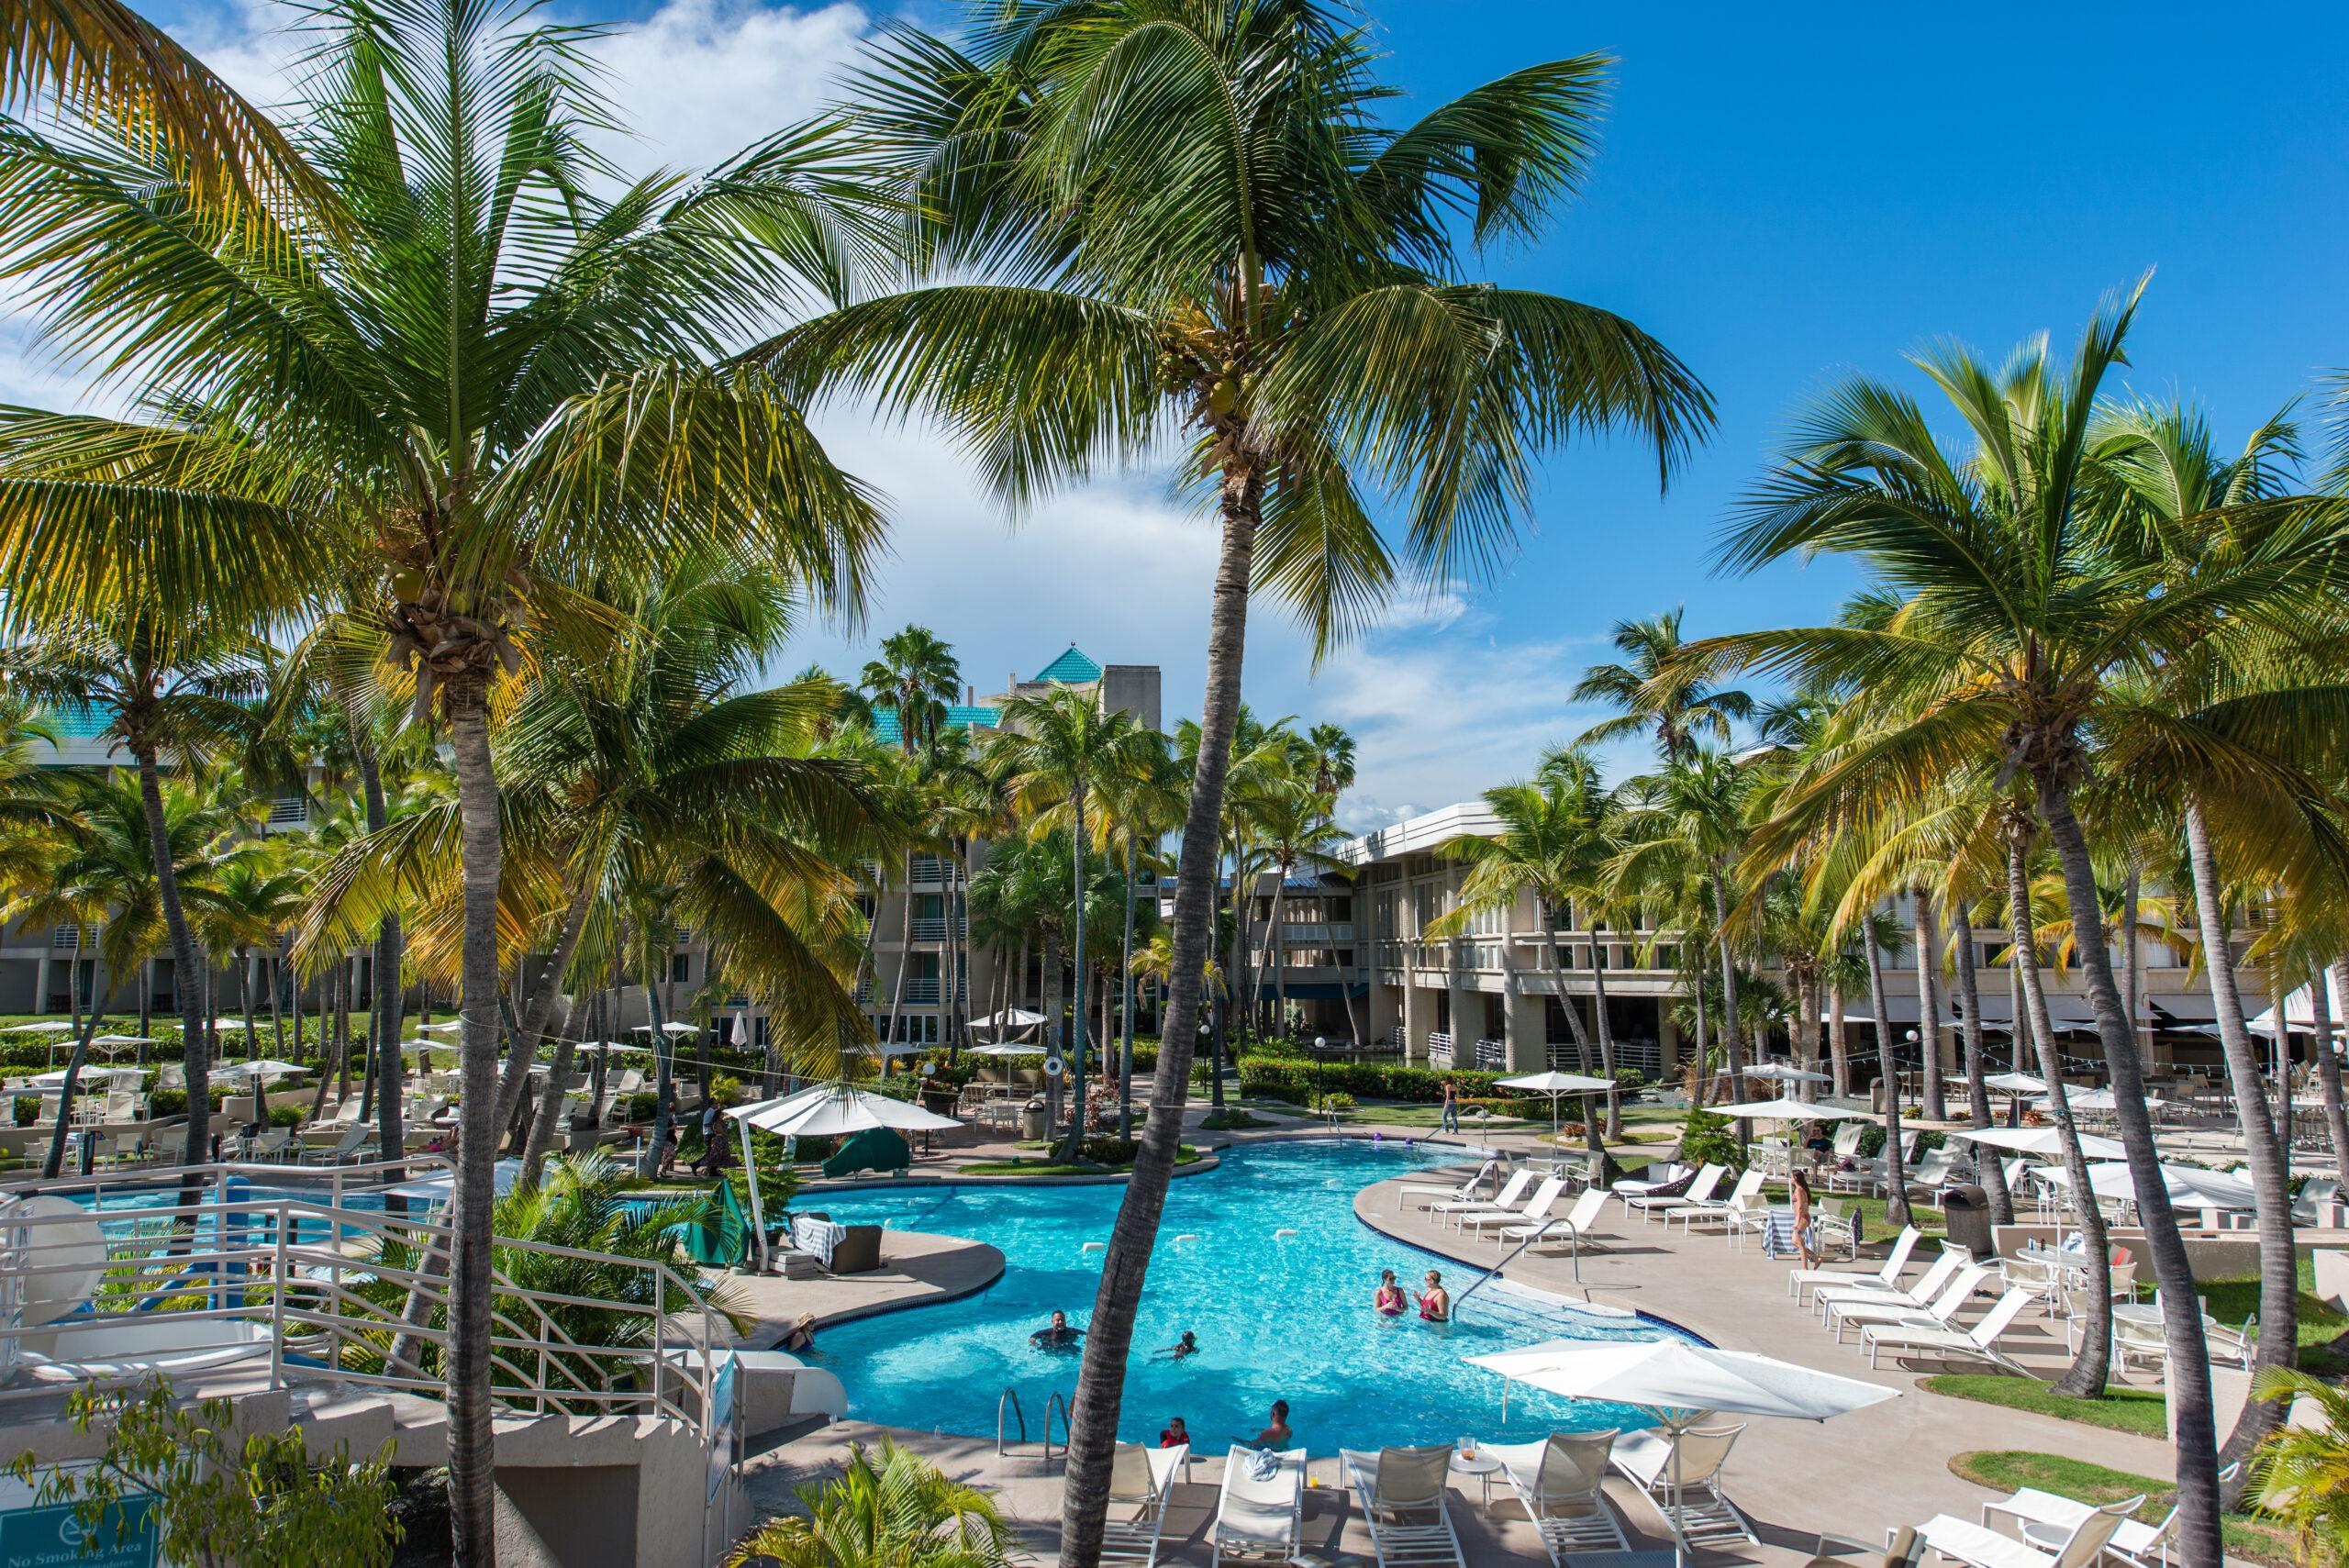 Ponce golf and casino resort hoyle casino 5 cheat codes